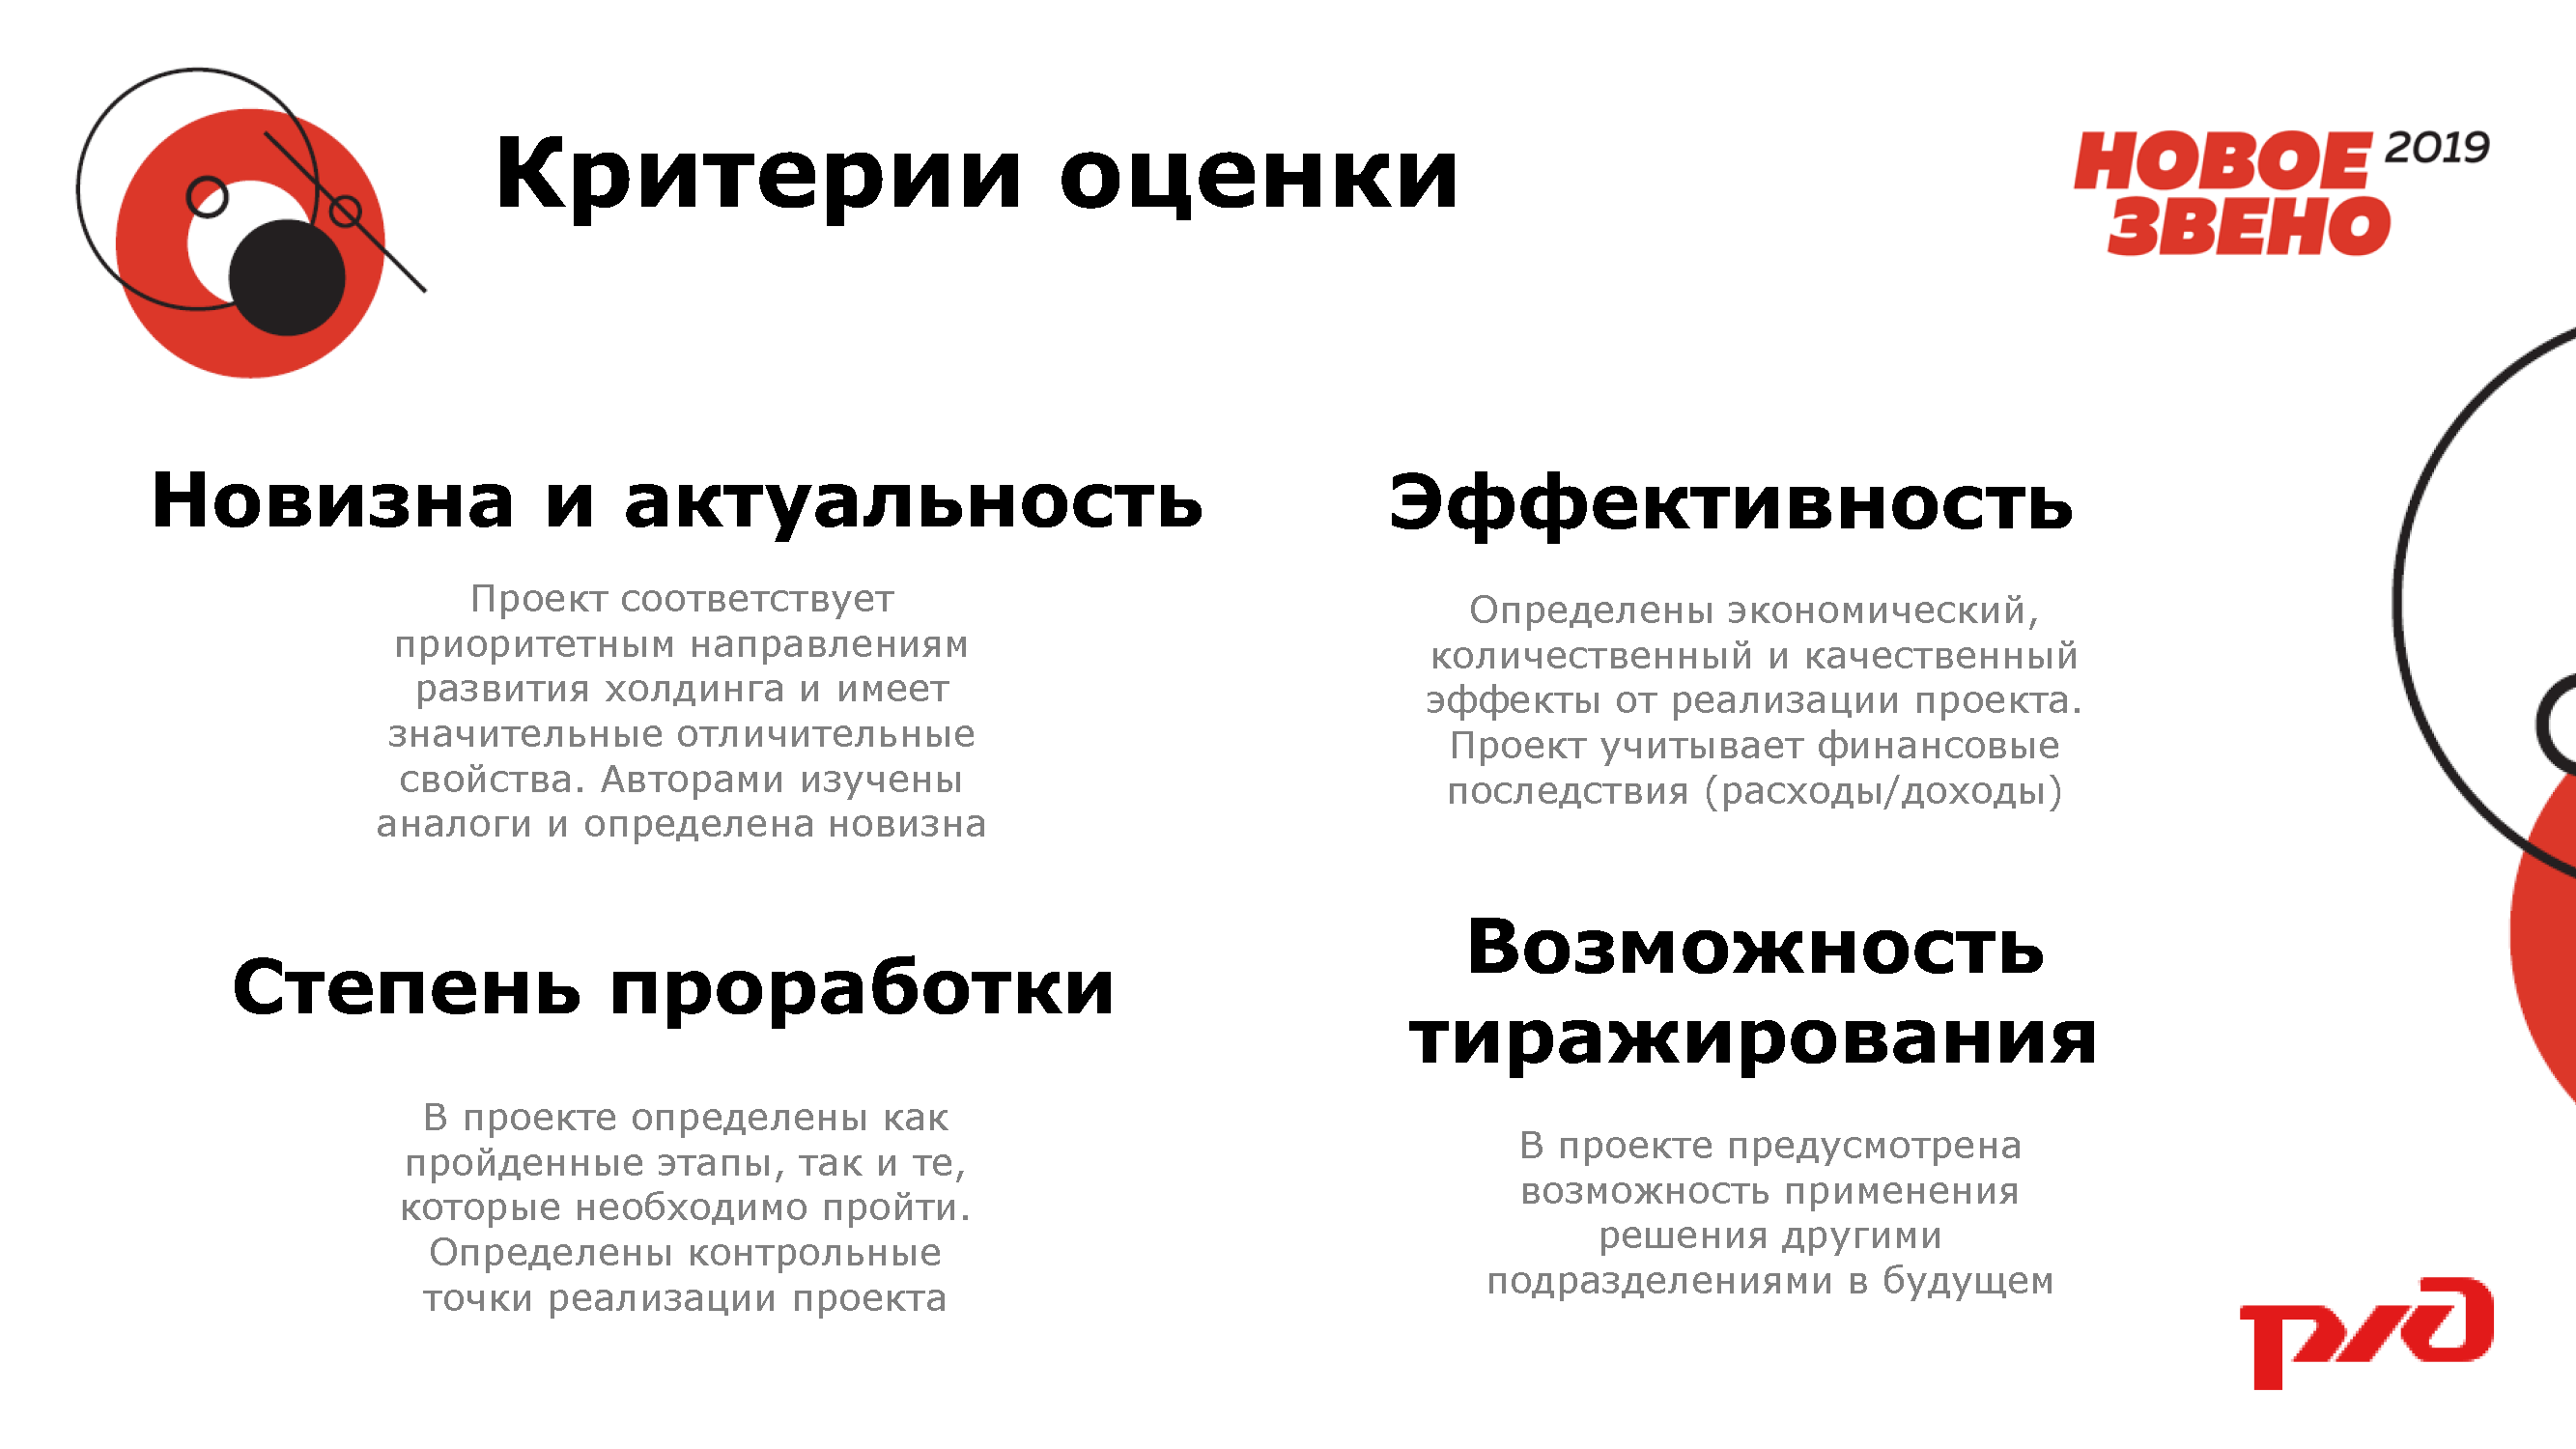 Общая презентация_Новое звено ИТОГ_Страница_7